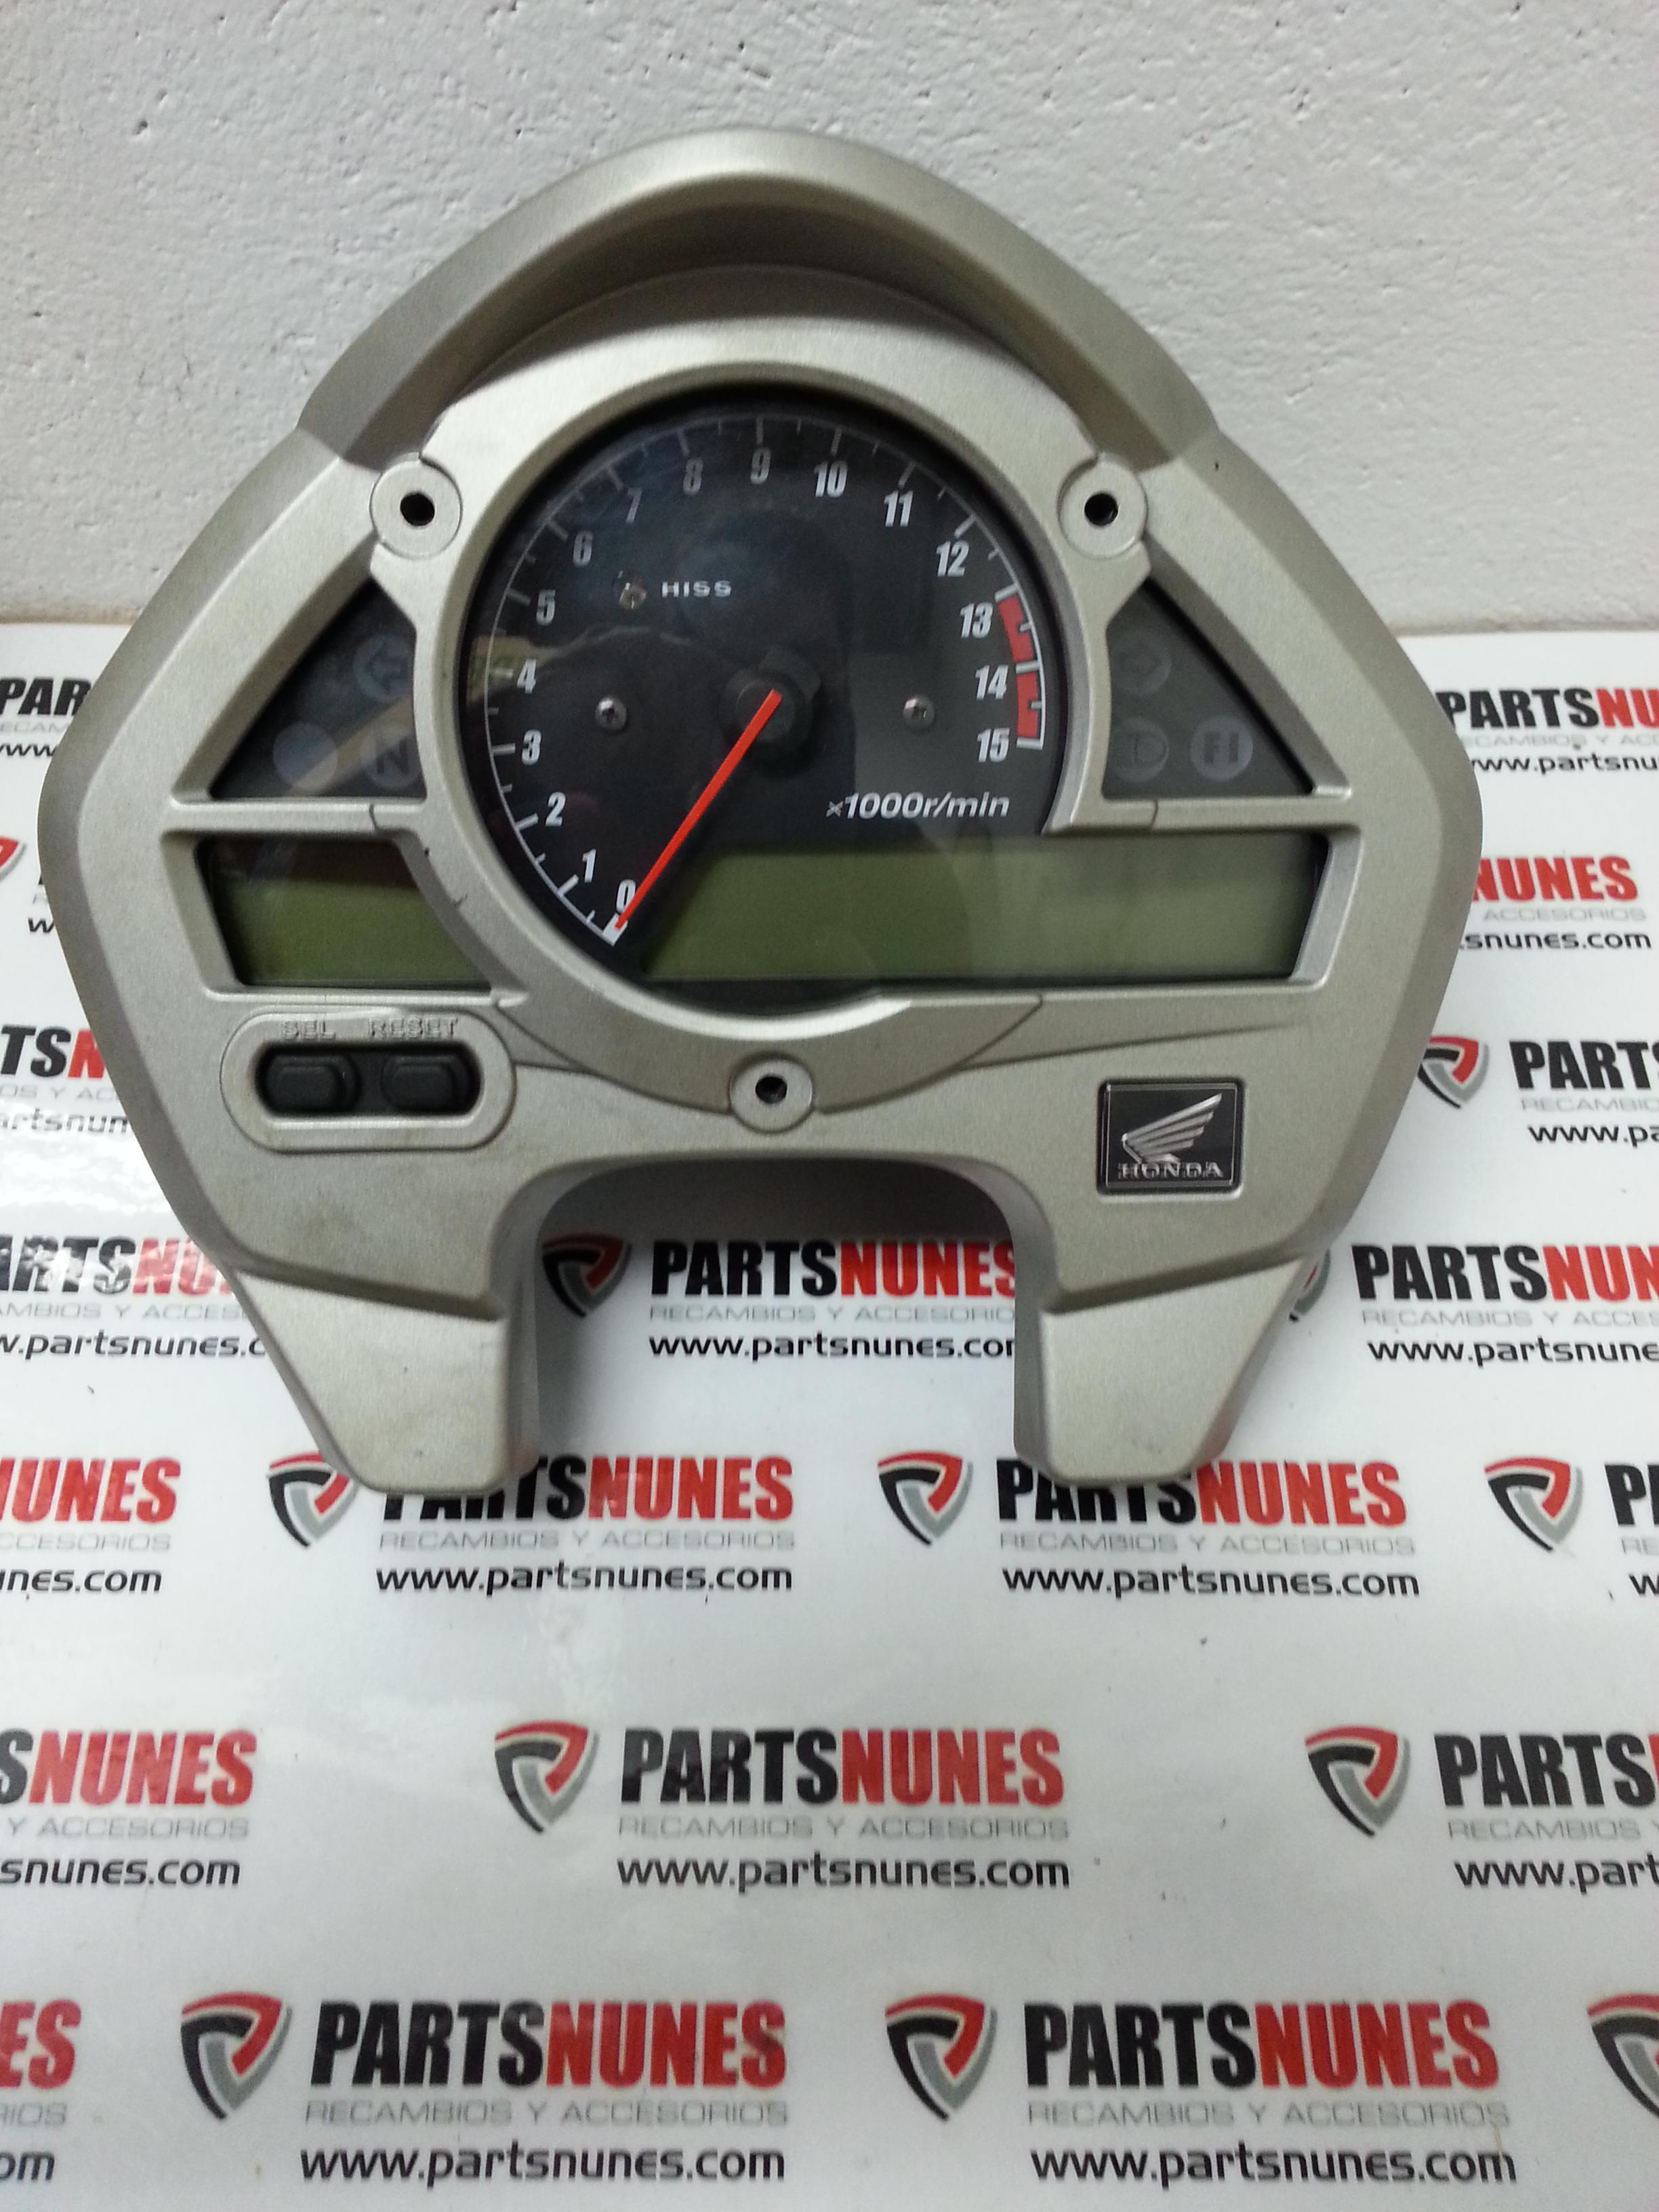 Relojes Honda Hornet Cb 600f Partsnunes